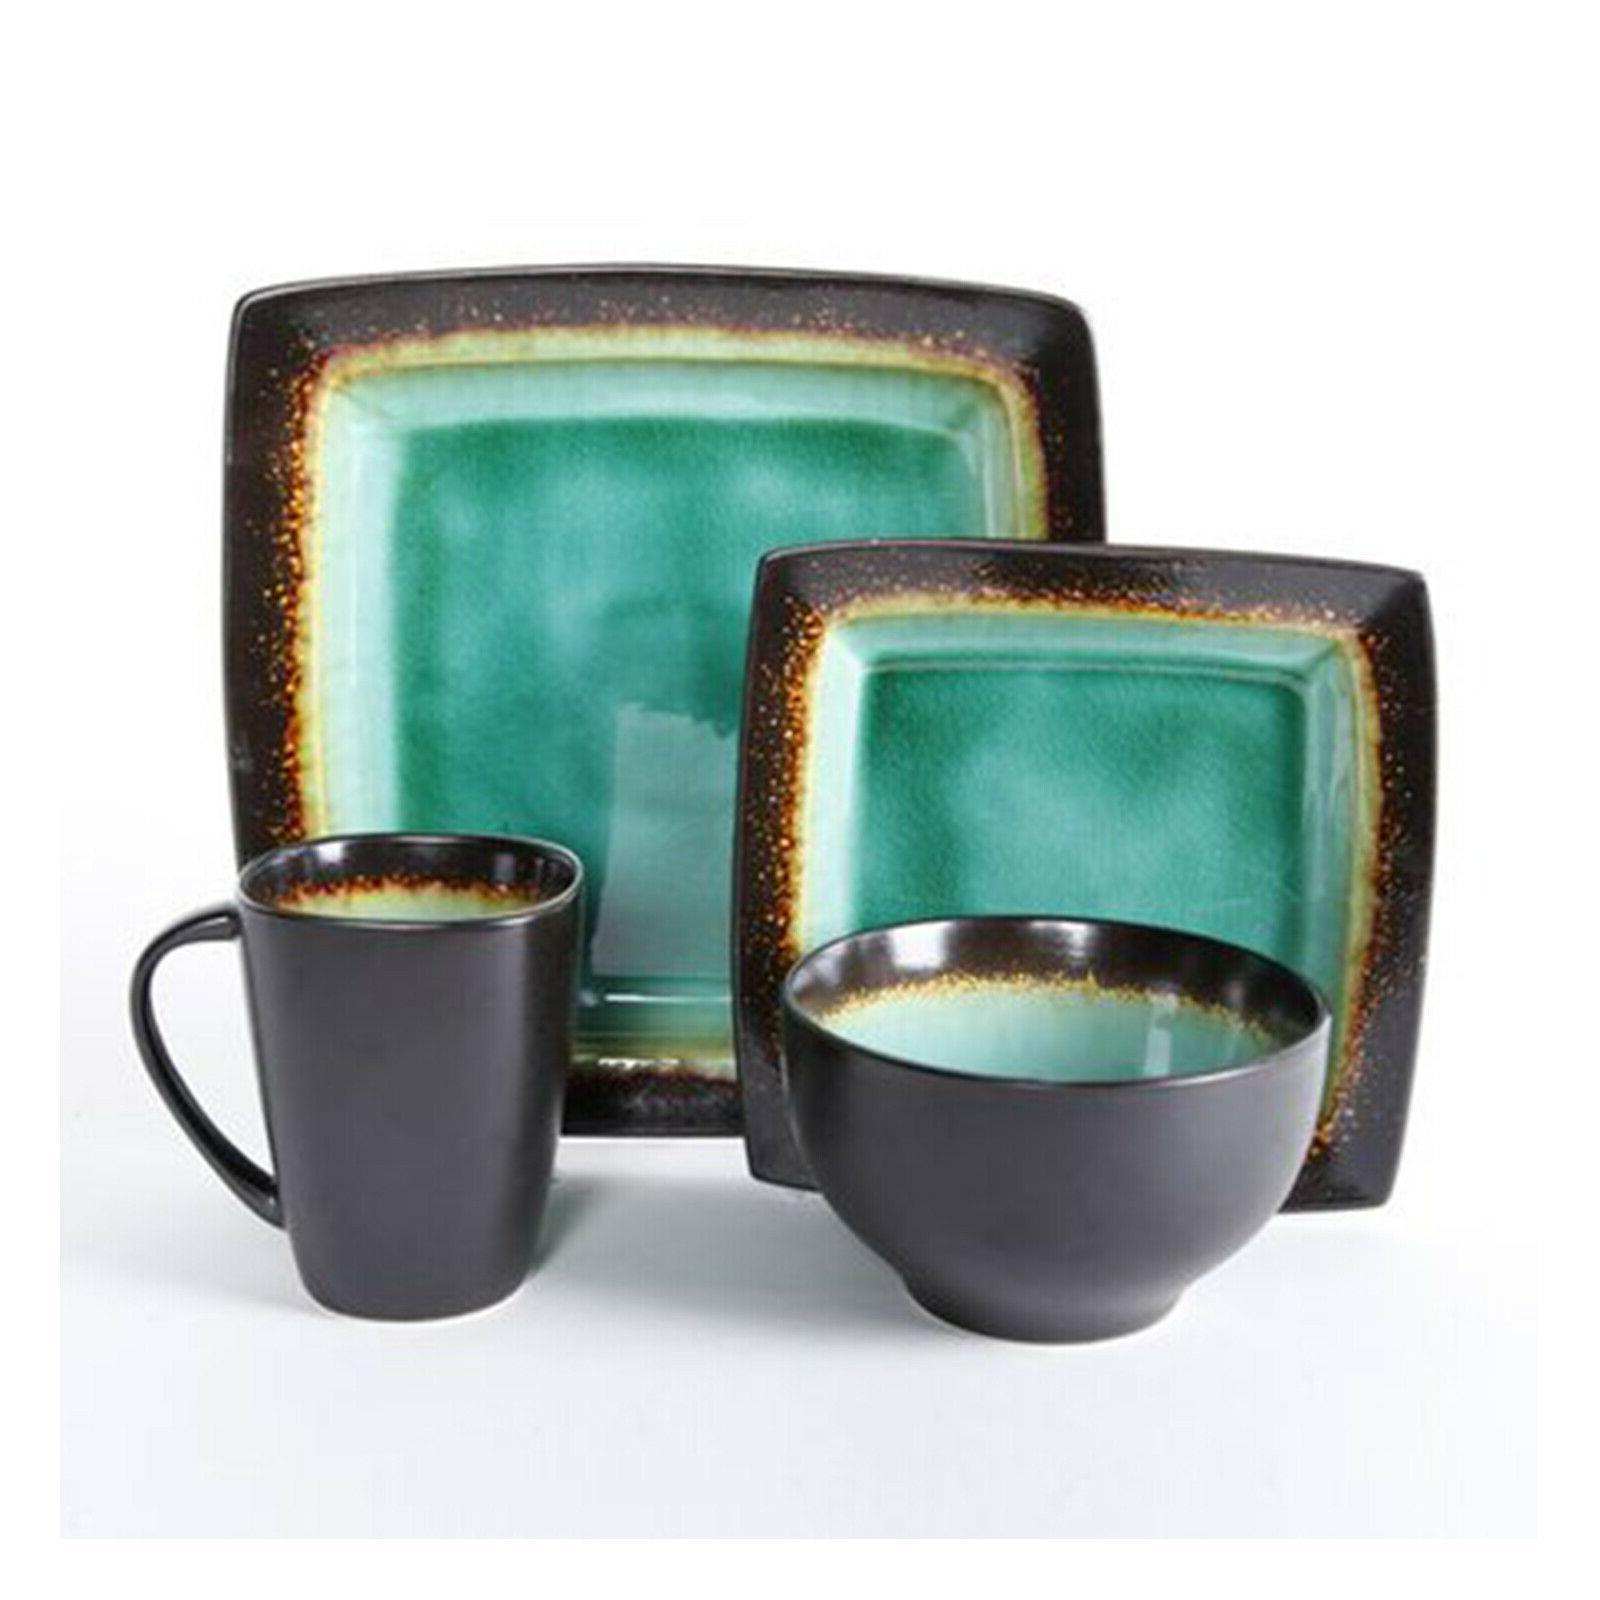 Square Set 4 Stoneware Plates Bowls Dishes New